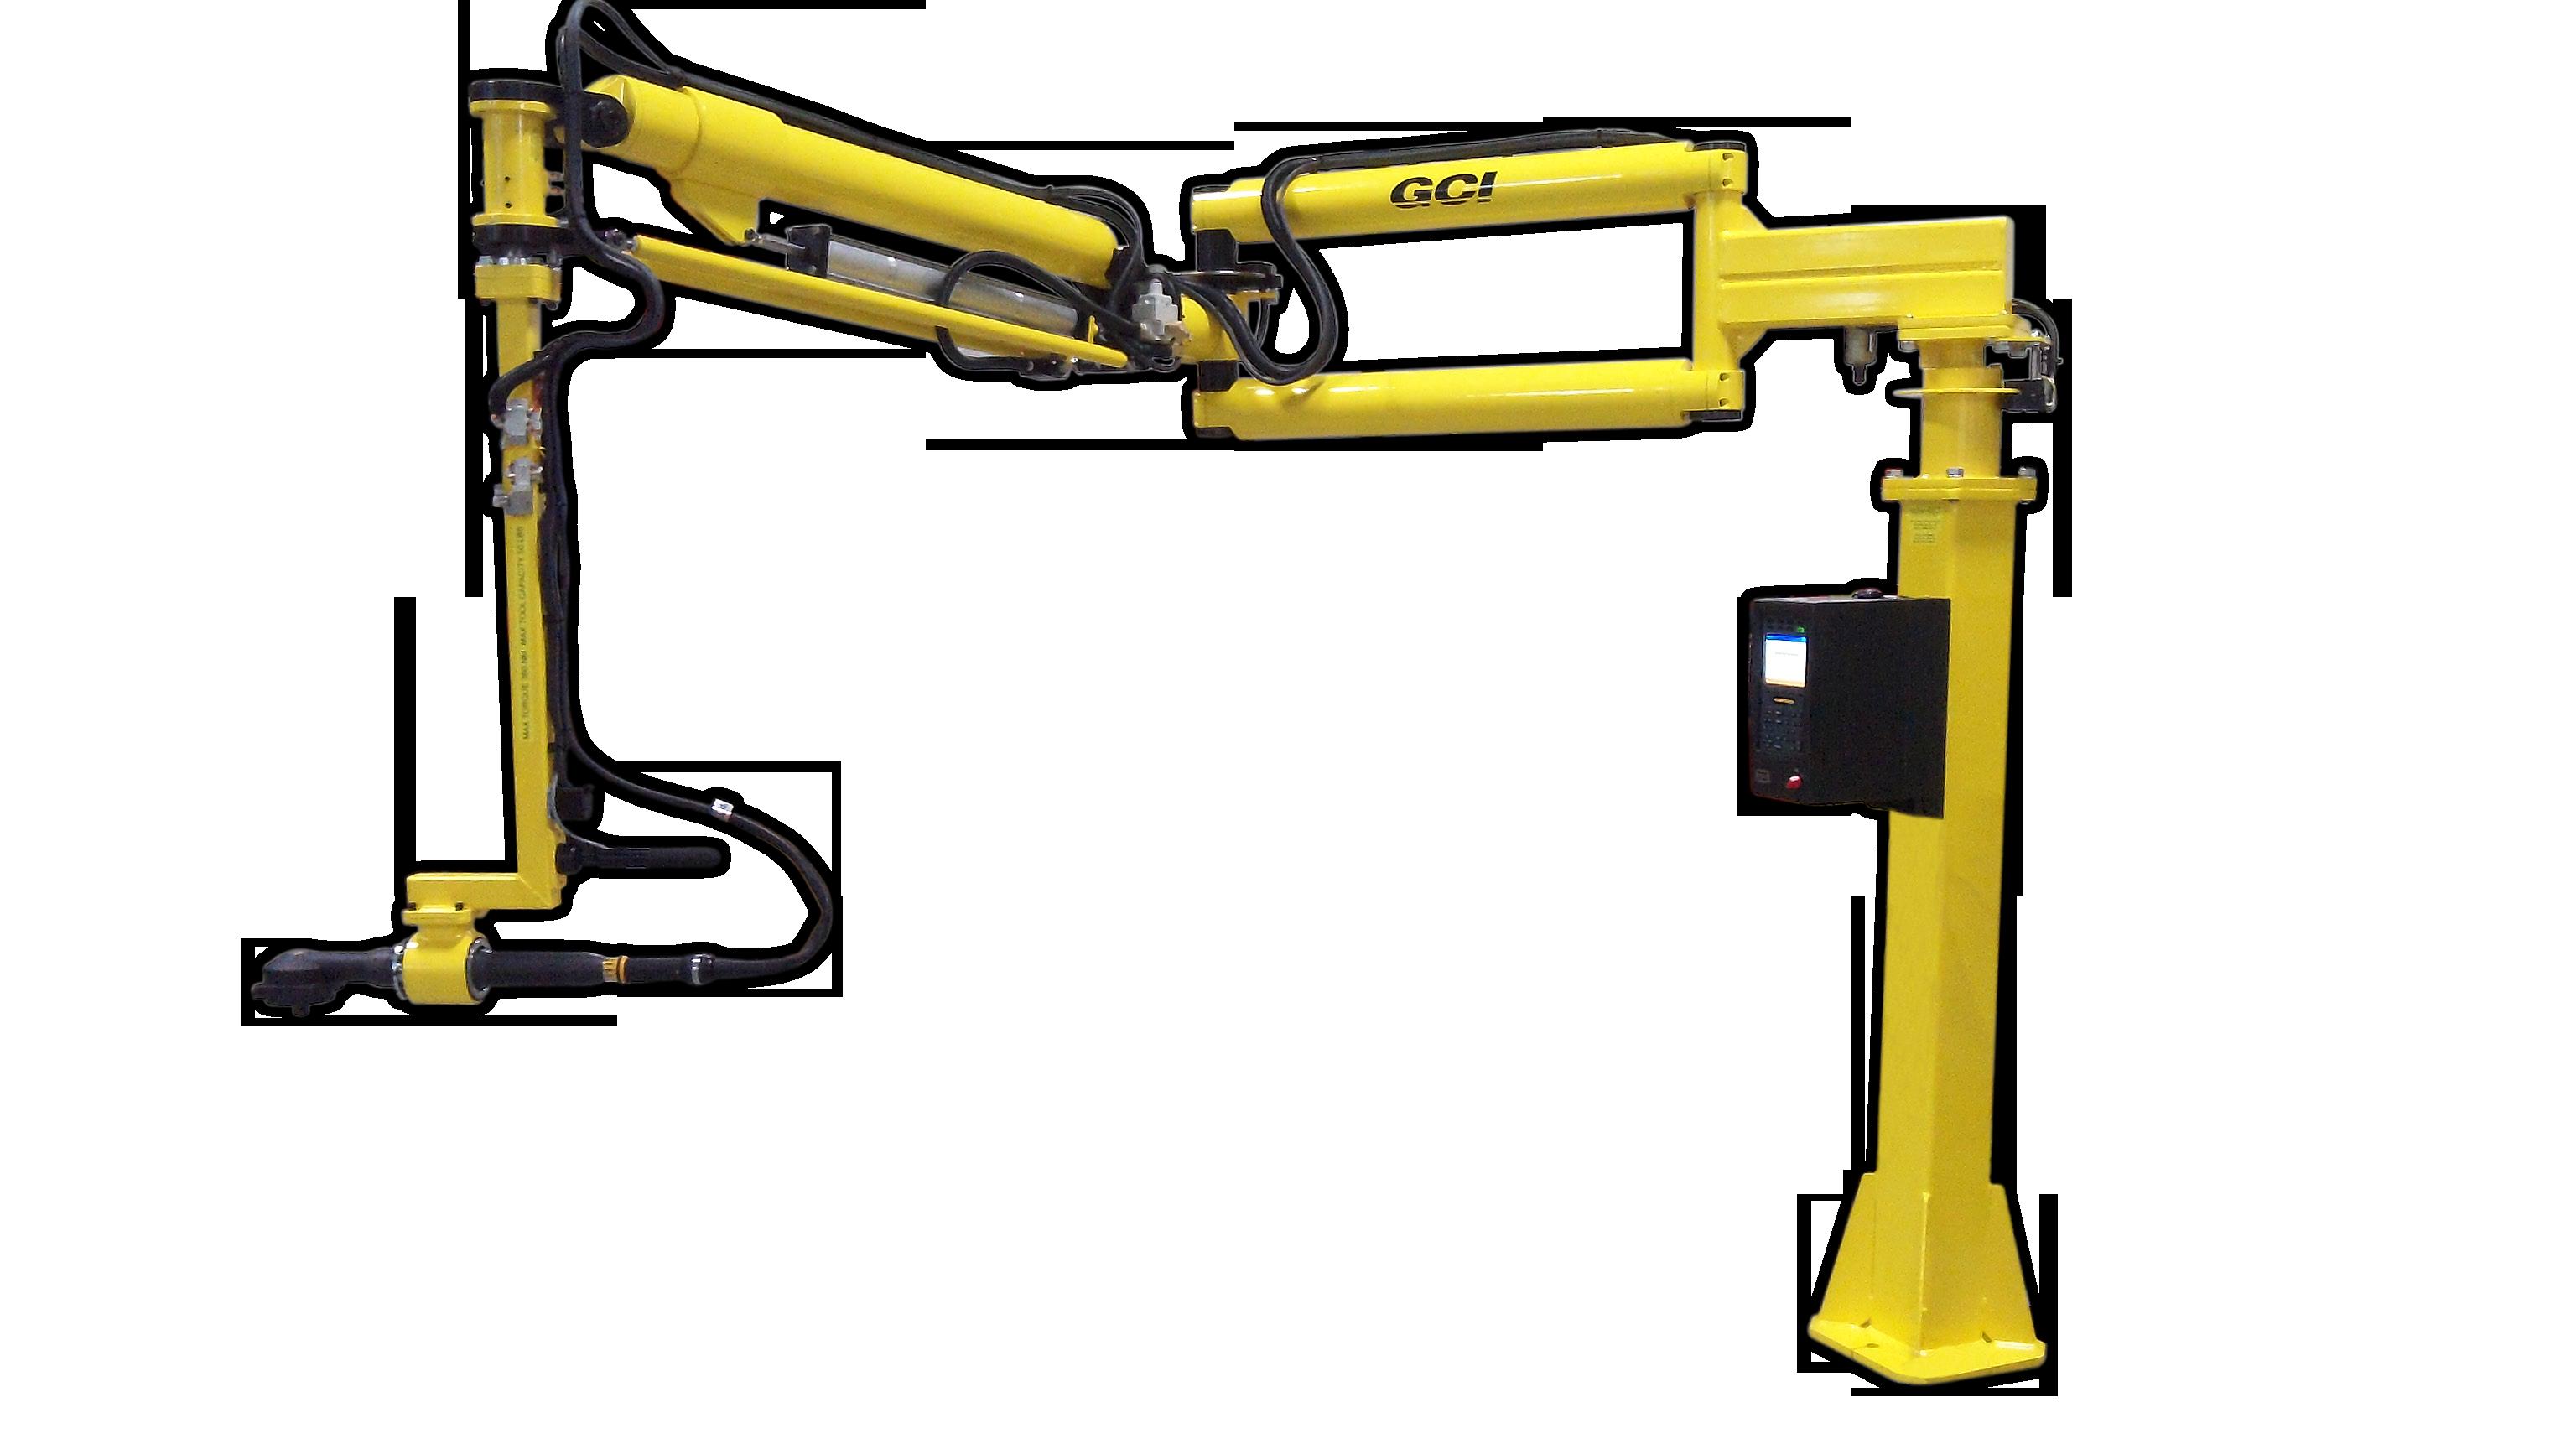 Gci Torque Arm : Gci custom material handling torque reaction systems